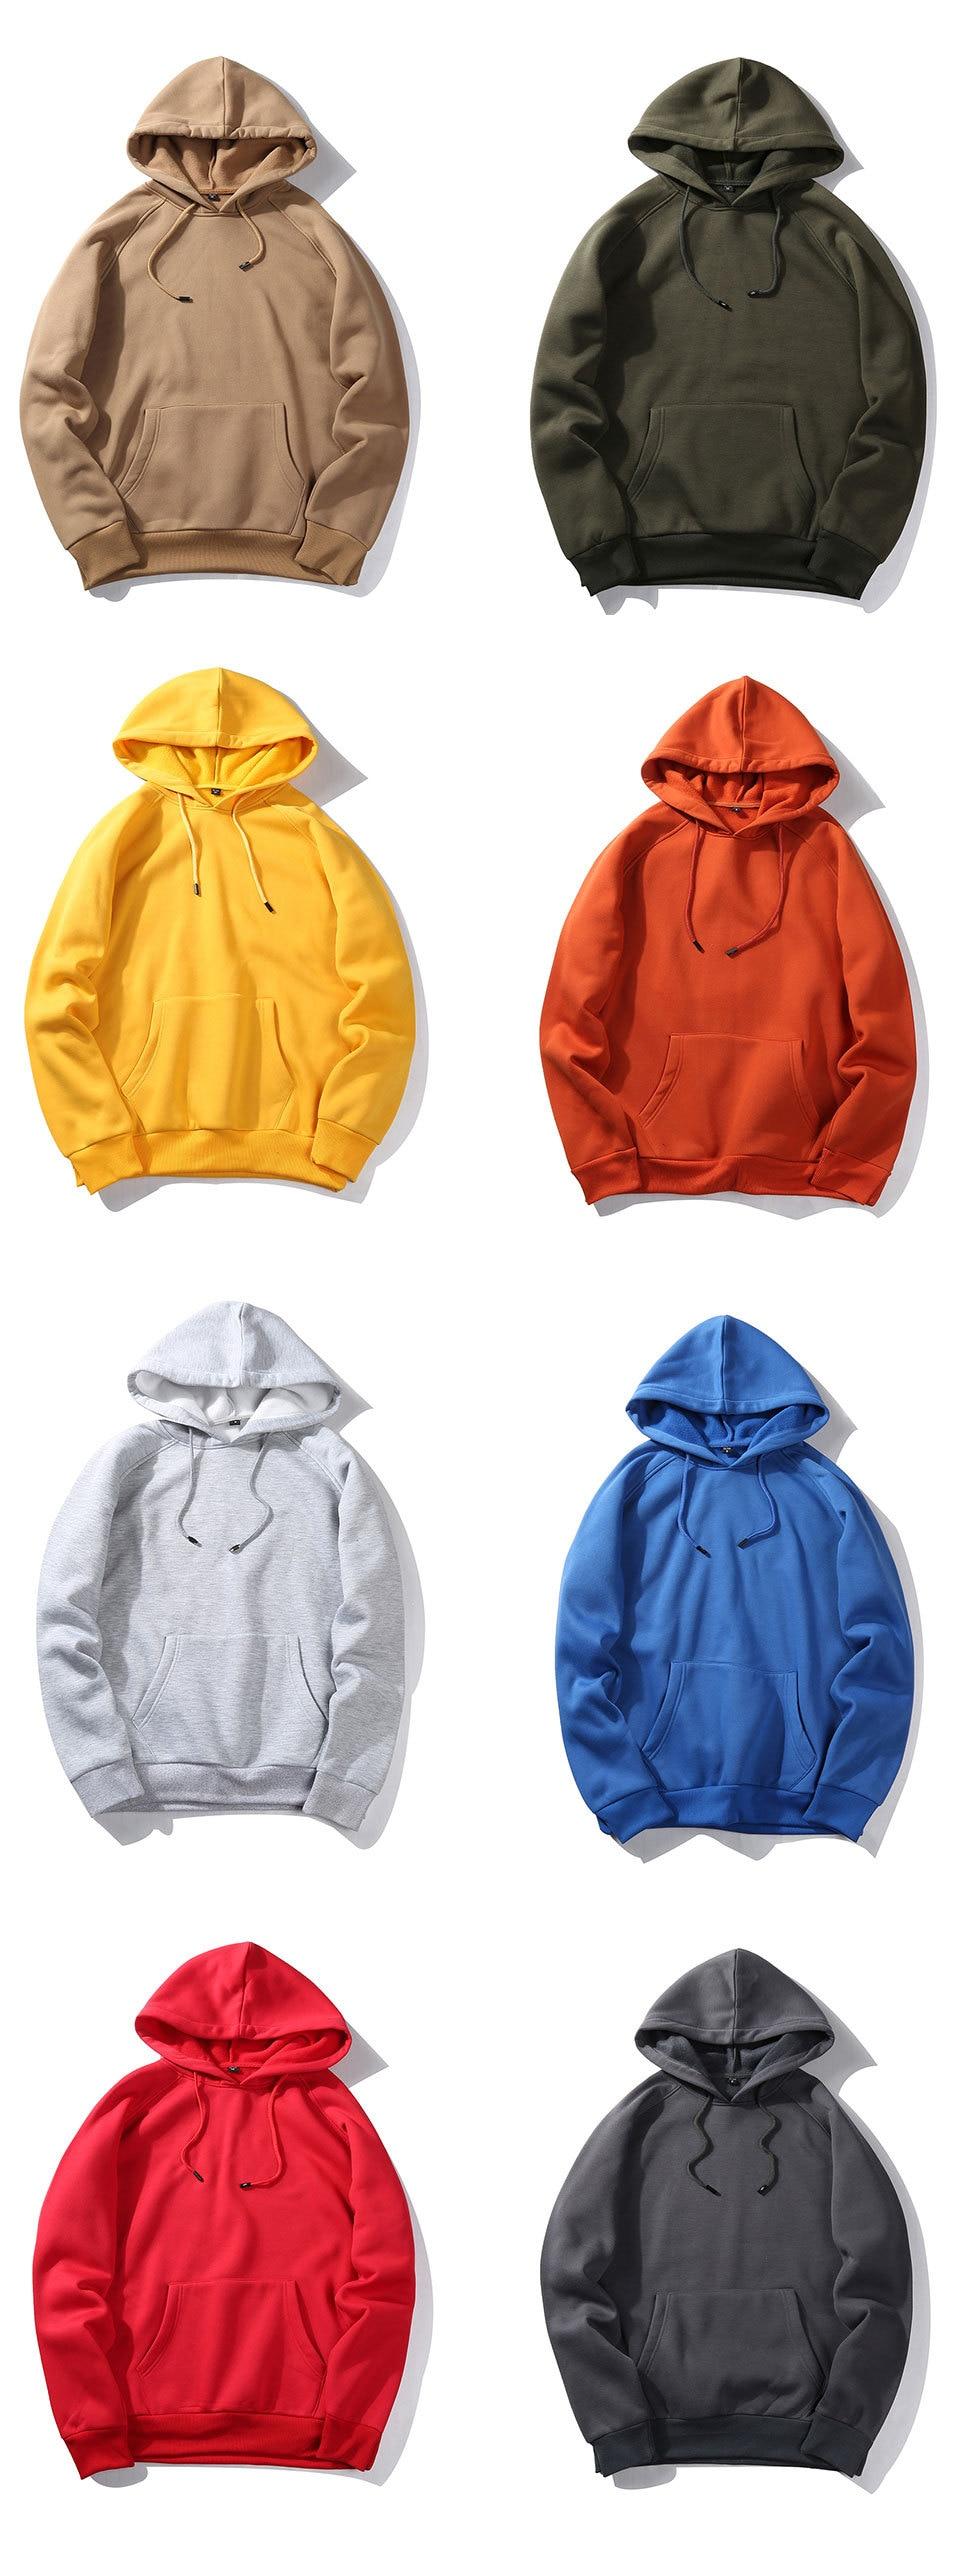 Fashion Hoodies Male Warm Fleece Coat Hooded Men Brand Hoodies Sweatshirts 16